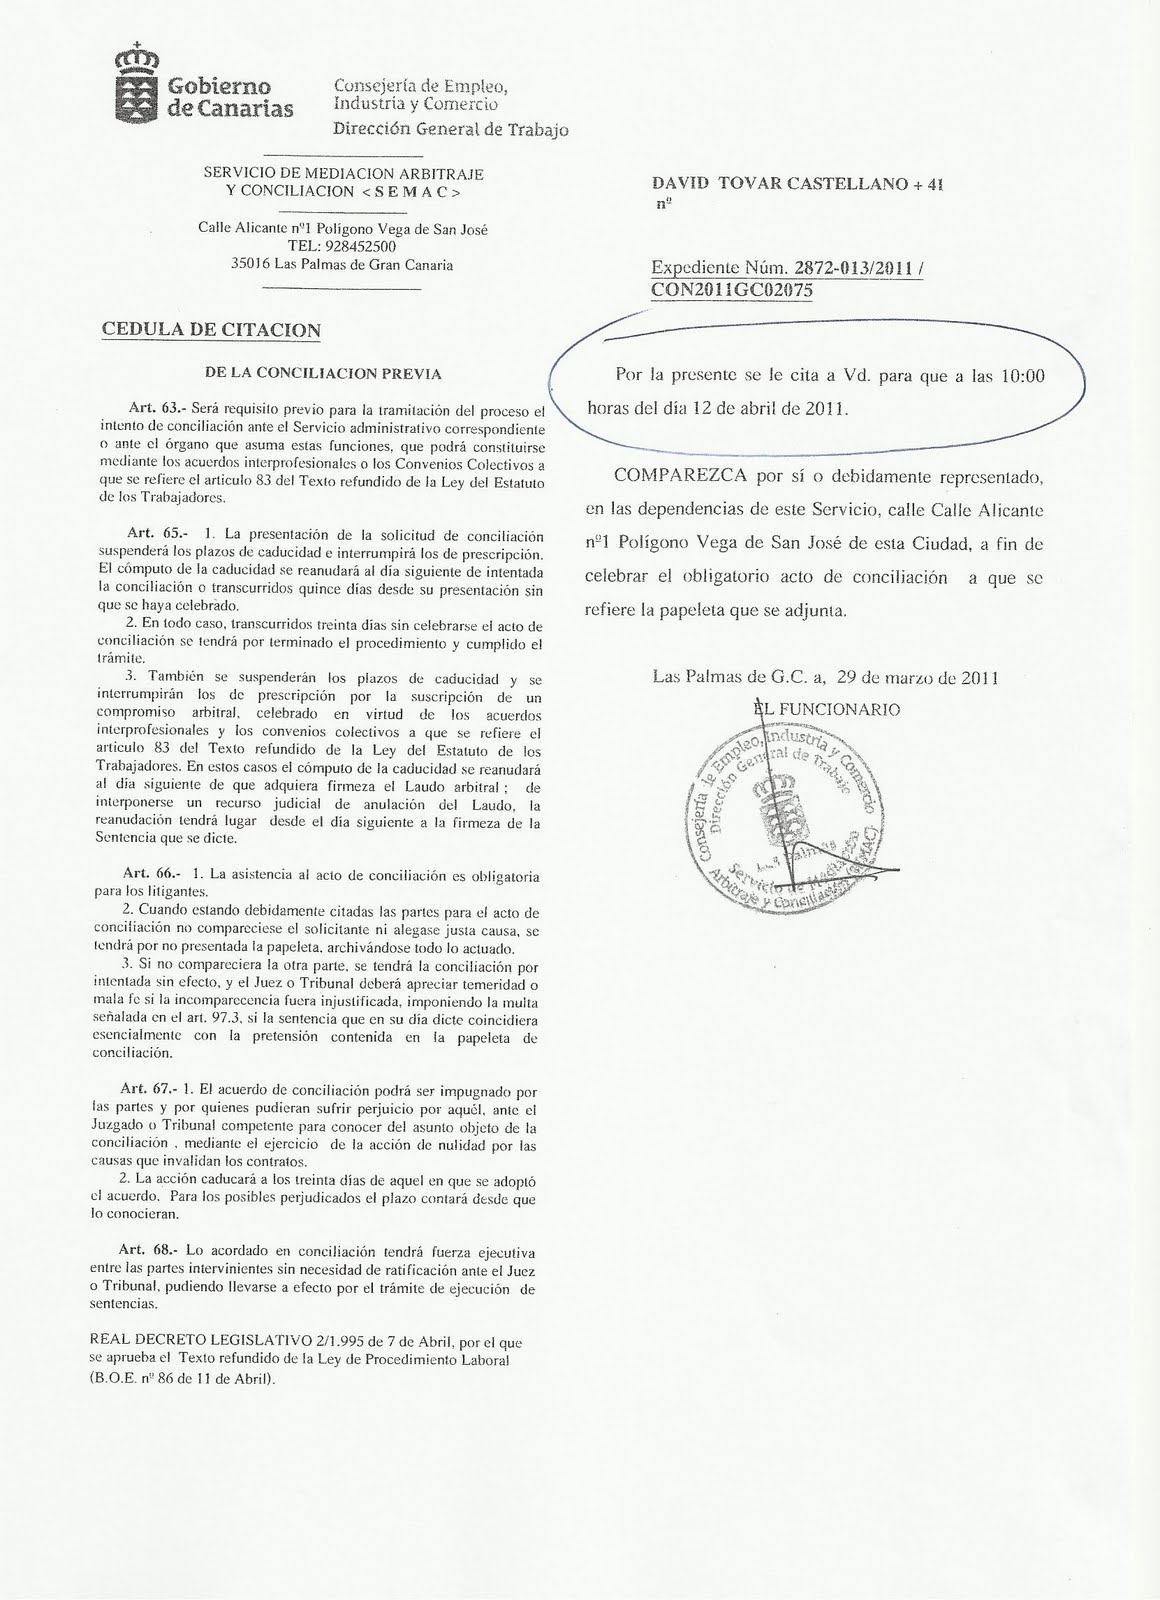 CATT-GLOBAL Salcai-Utinsa S.A.: marzo 2011